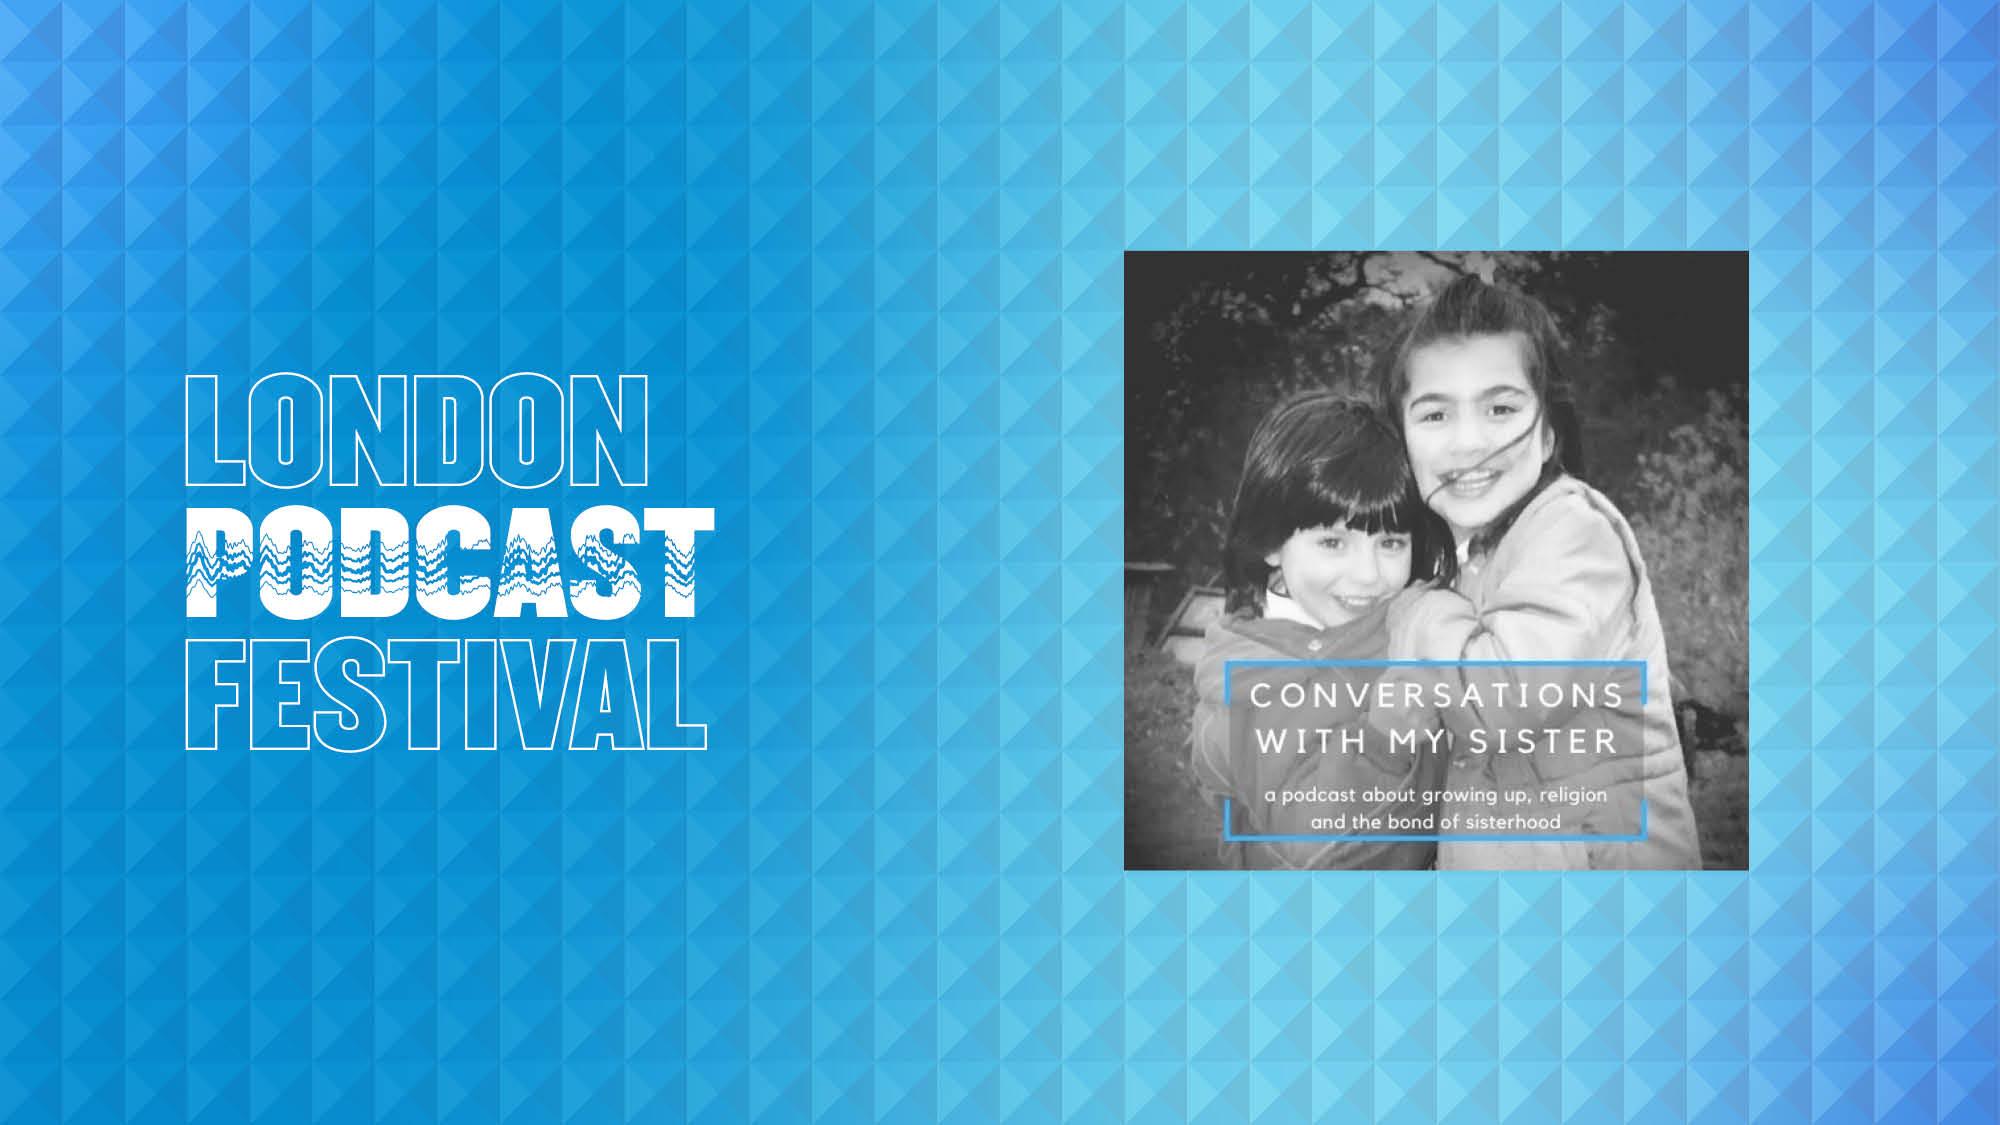 Podcast Festival in London